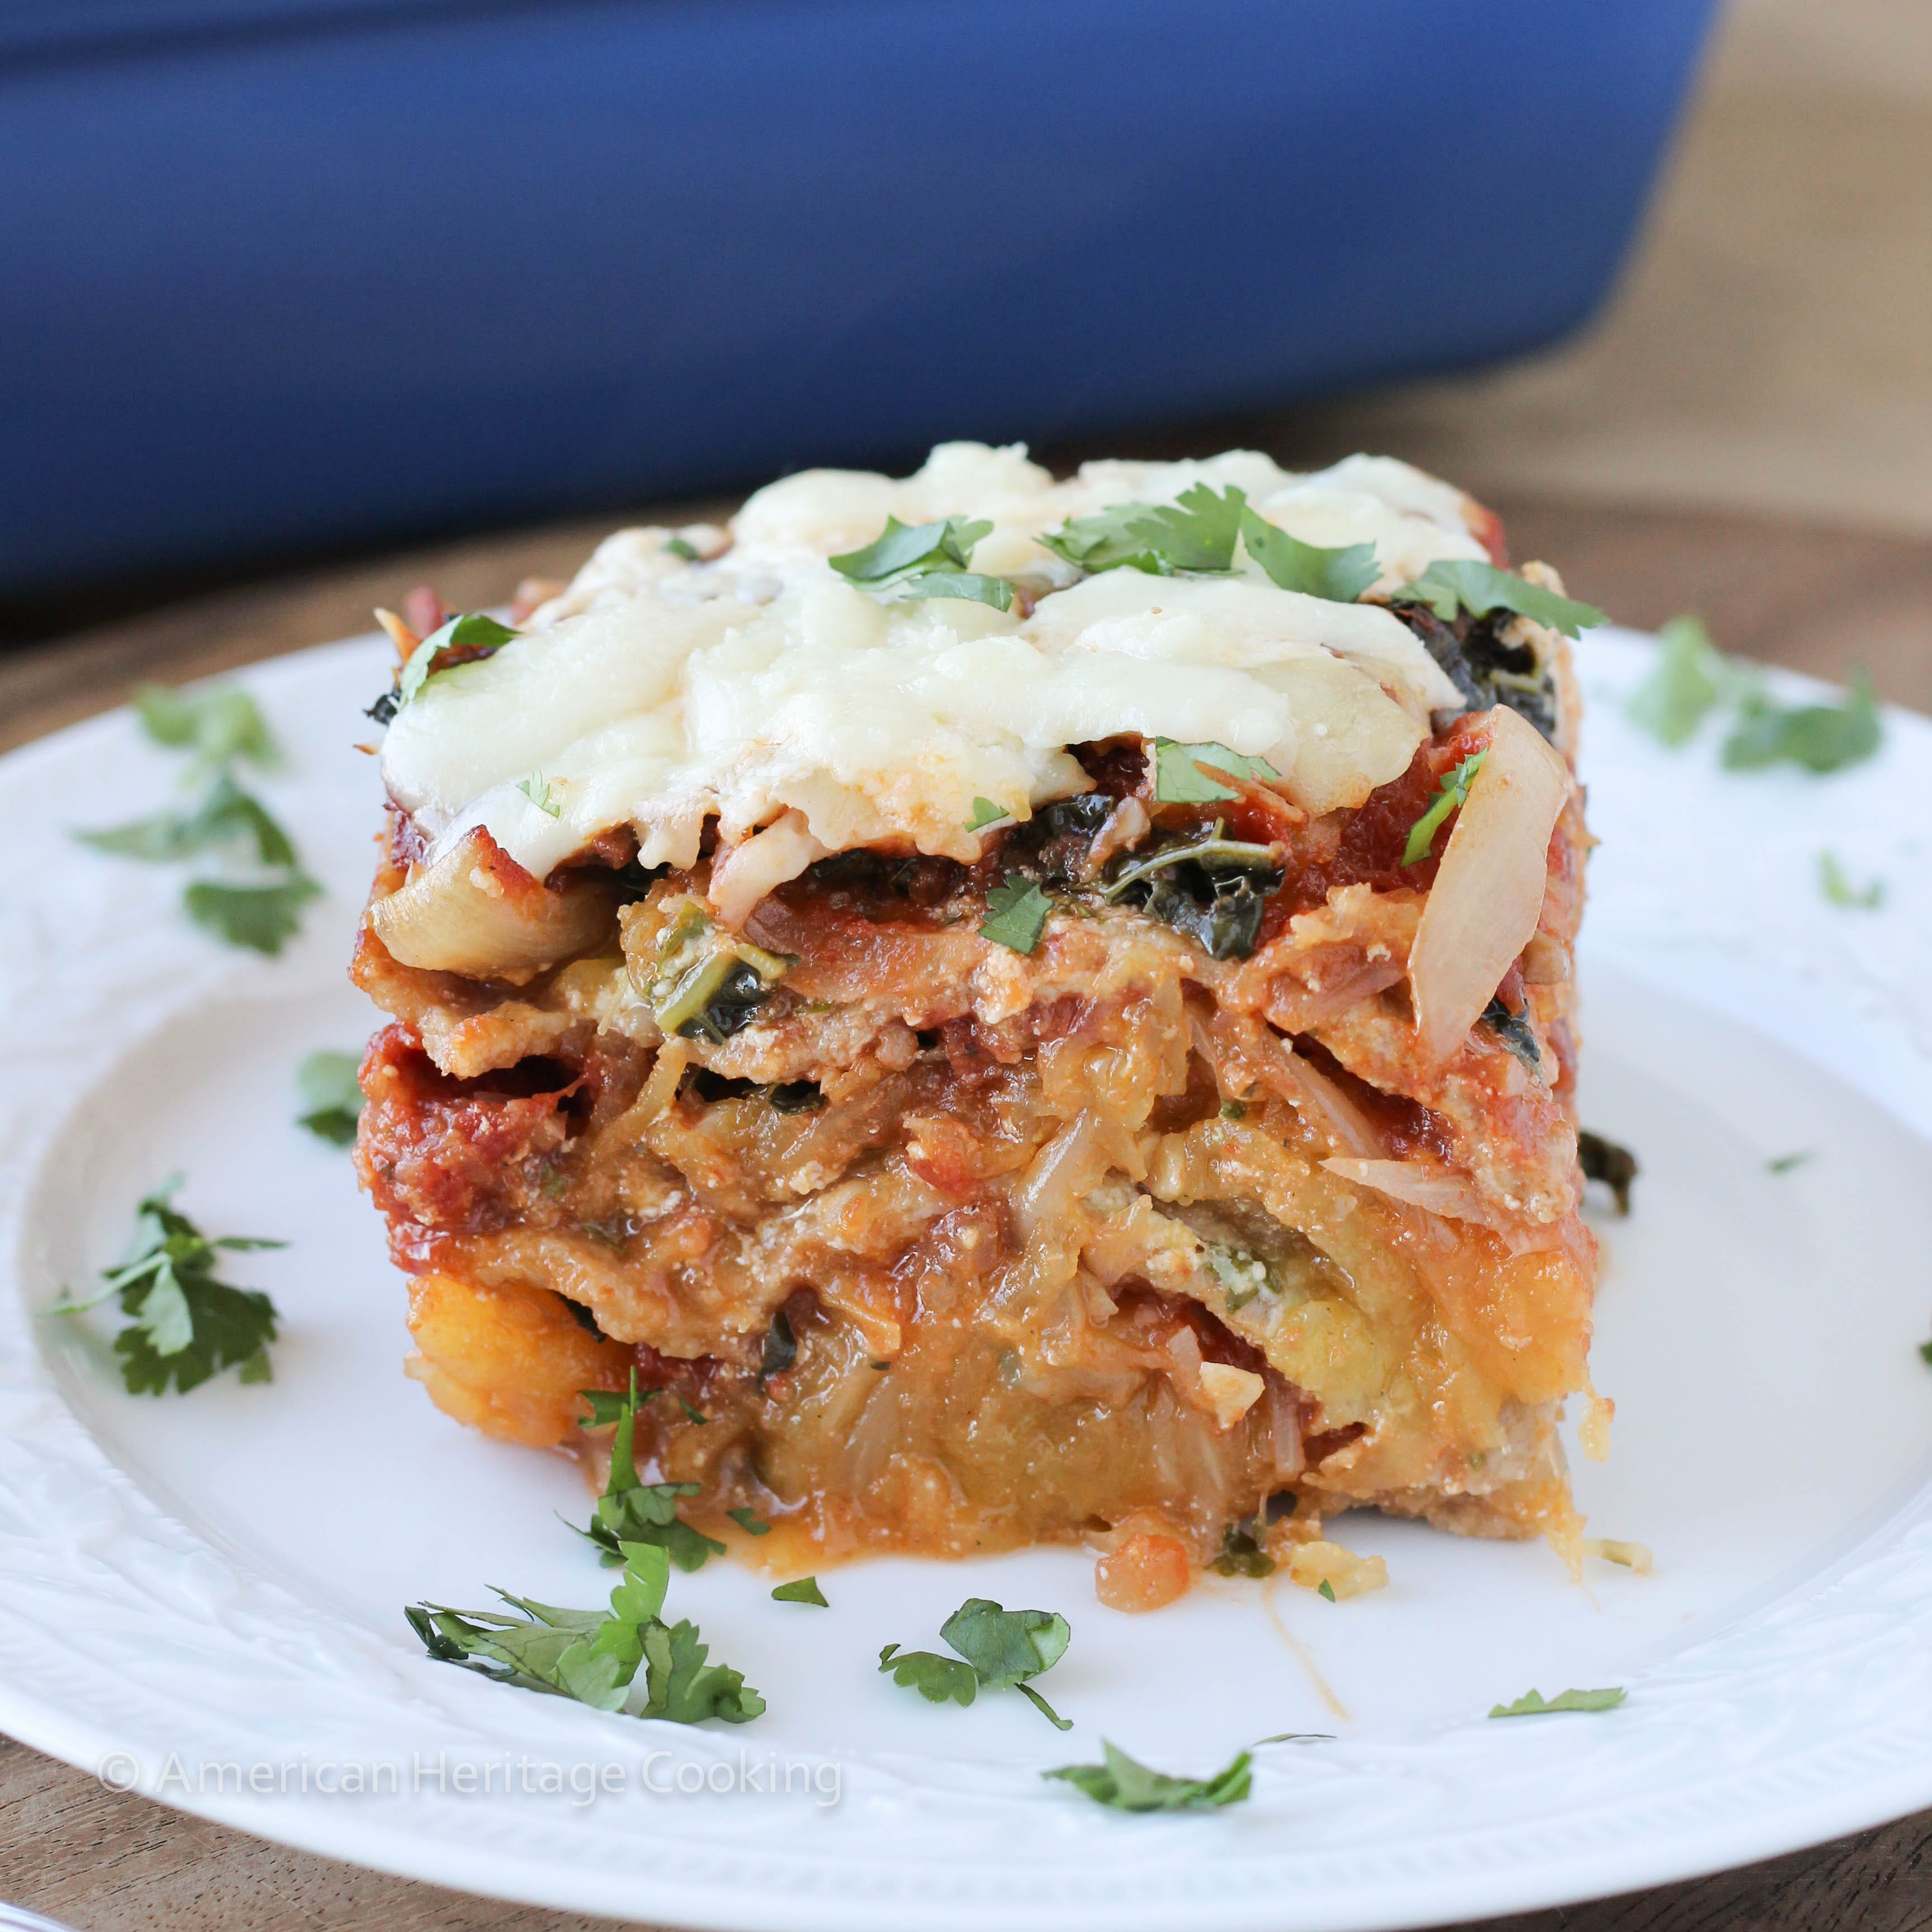 Spaghetti Squash Kale Lasagna - American Heritage Cooking